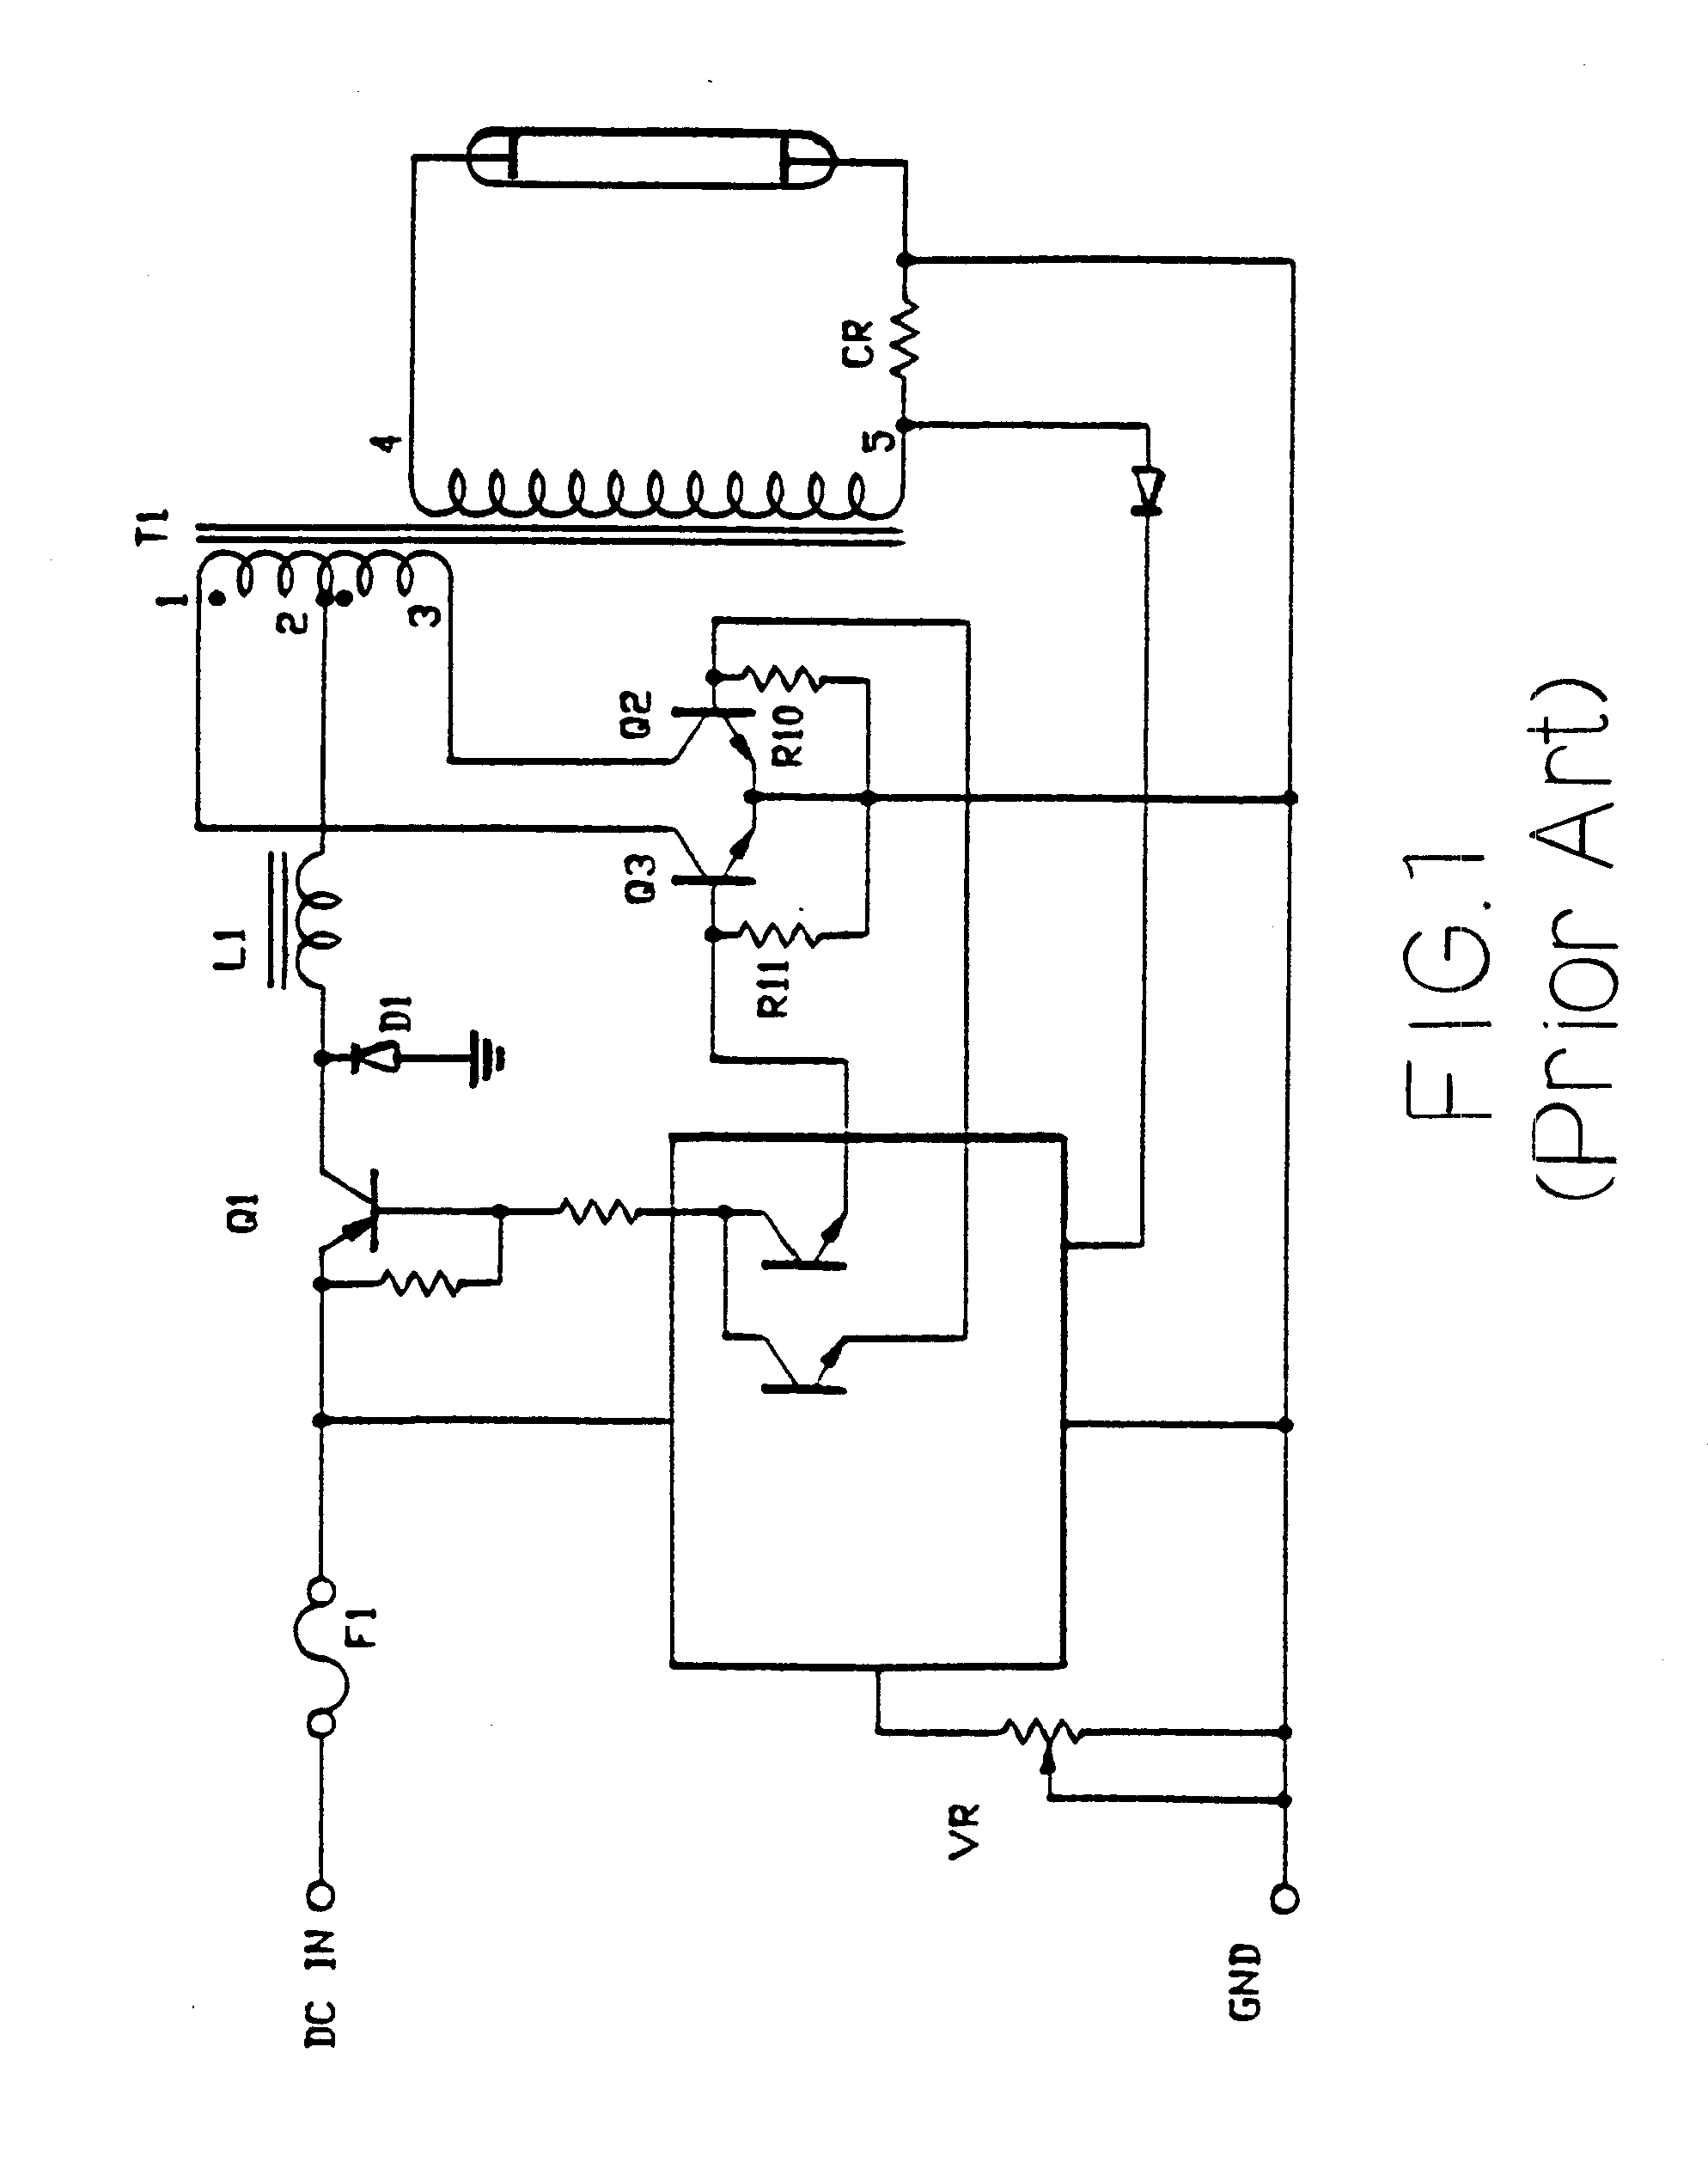 Us6583586b1 Brightness Regulating Voltage Transforming Circuit Energy Saving Lamp Diagram Controlcircuit For High Pressure Discharge Google Patents